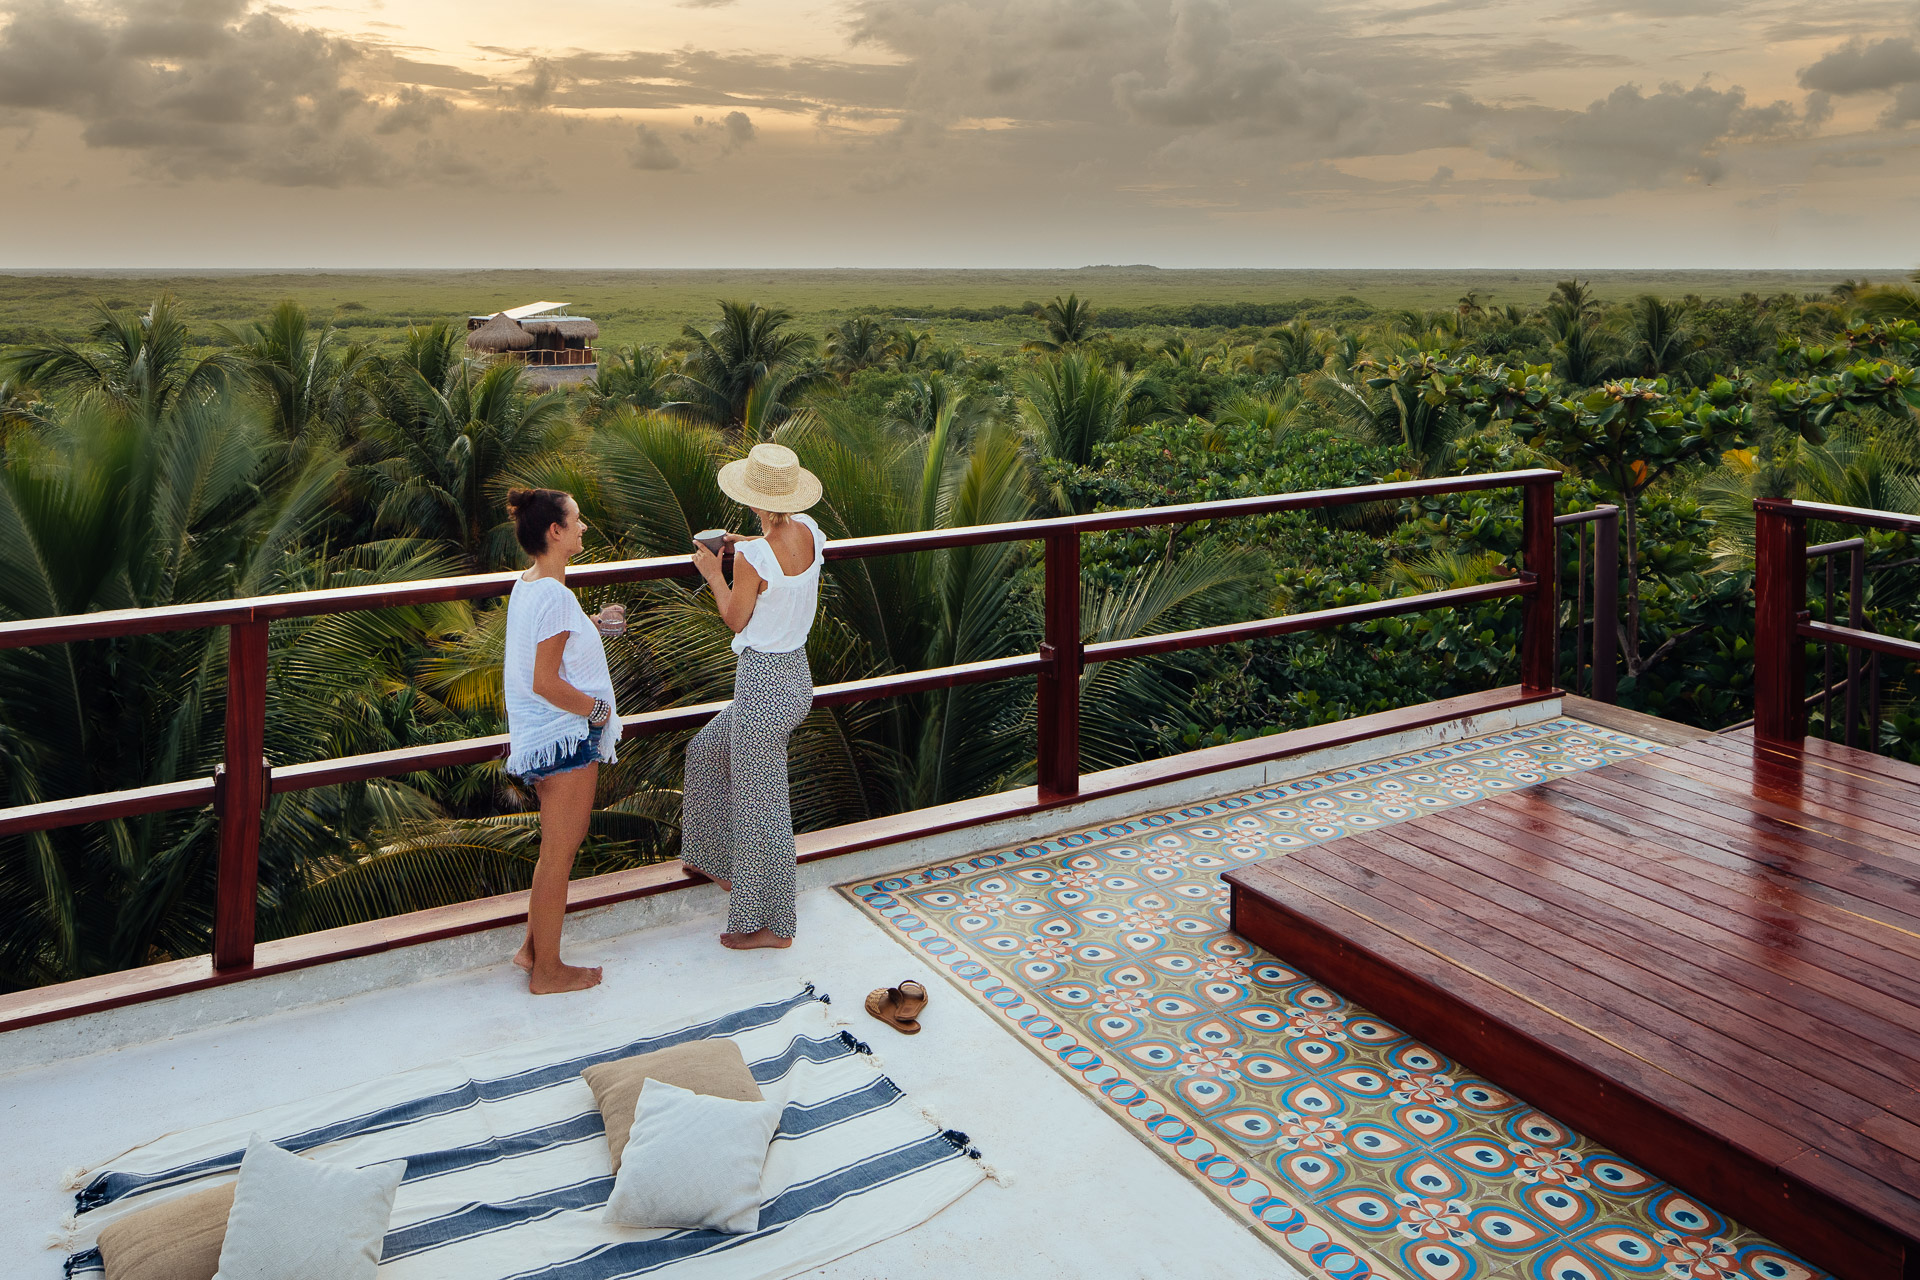 caribbean-hotel-resort-photographer-olas-tulum-mexico--10.jpg